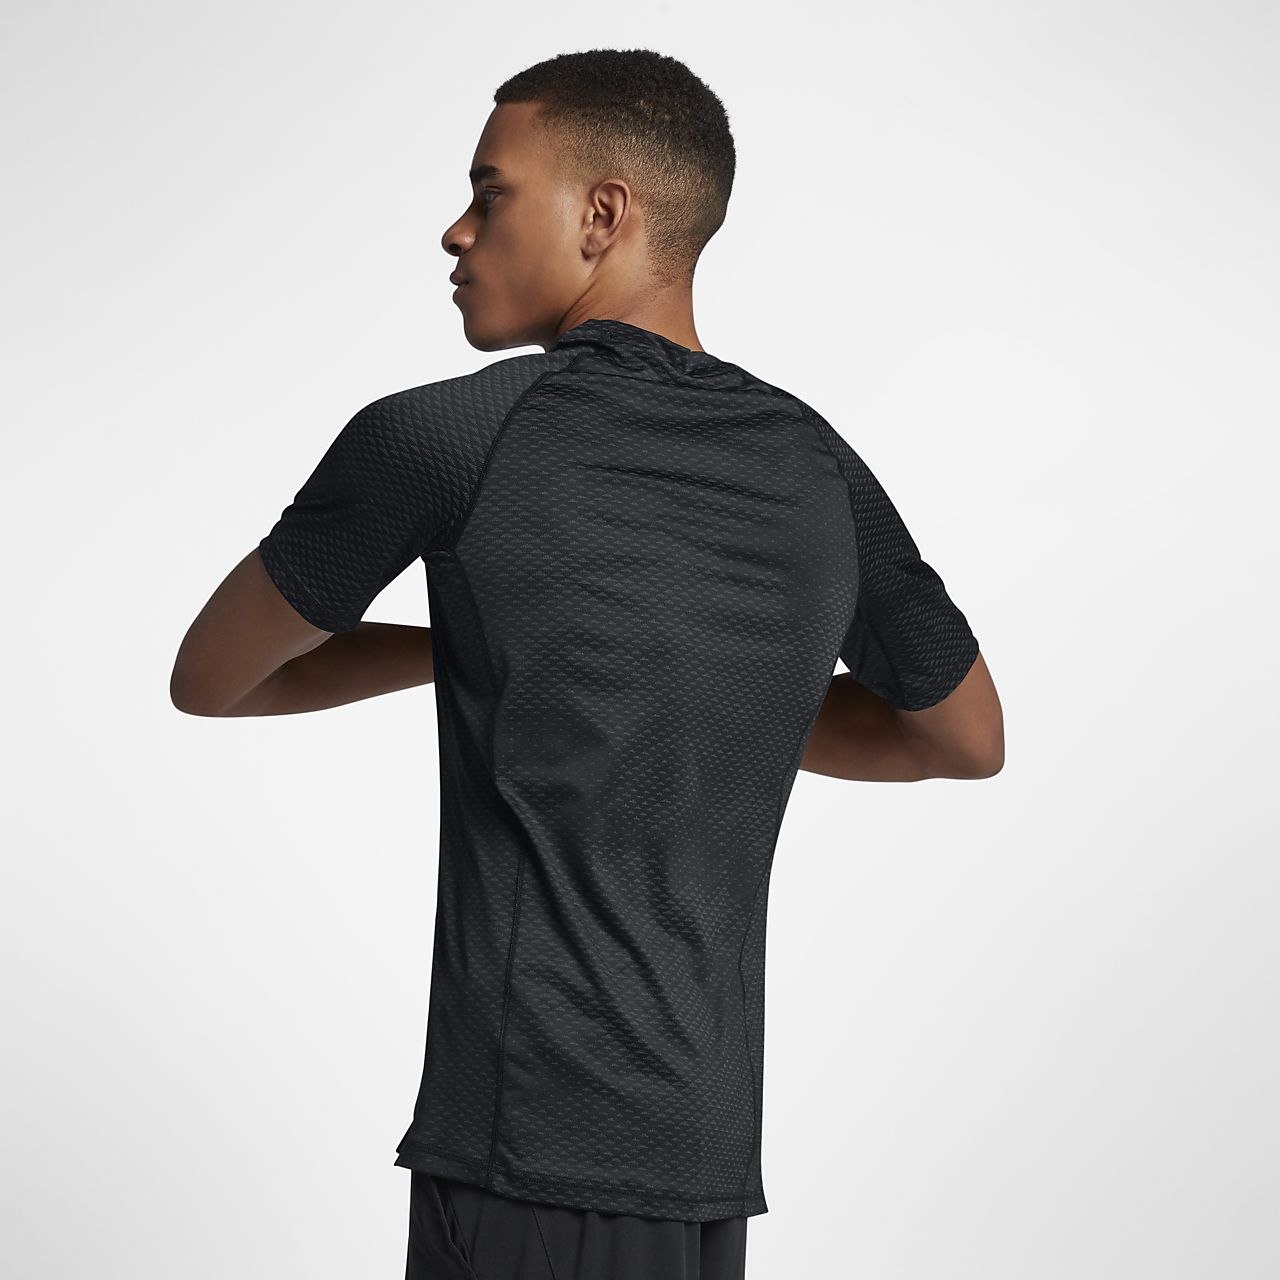 9512ae88 Nike Pro HyperCool Men's Short-Sleeve Training Top. Nike.com CA